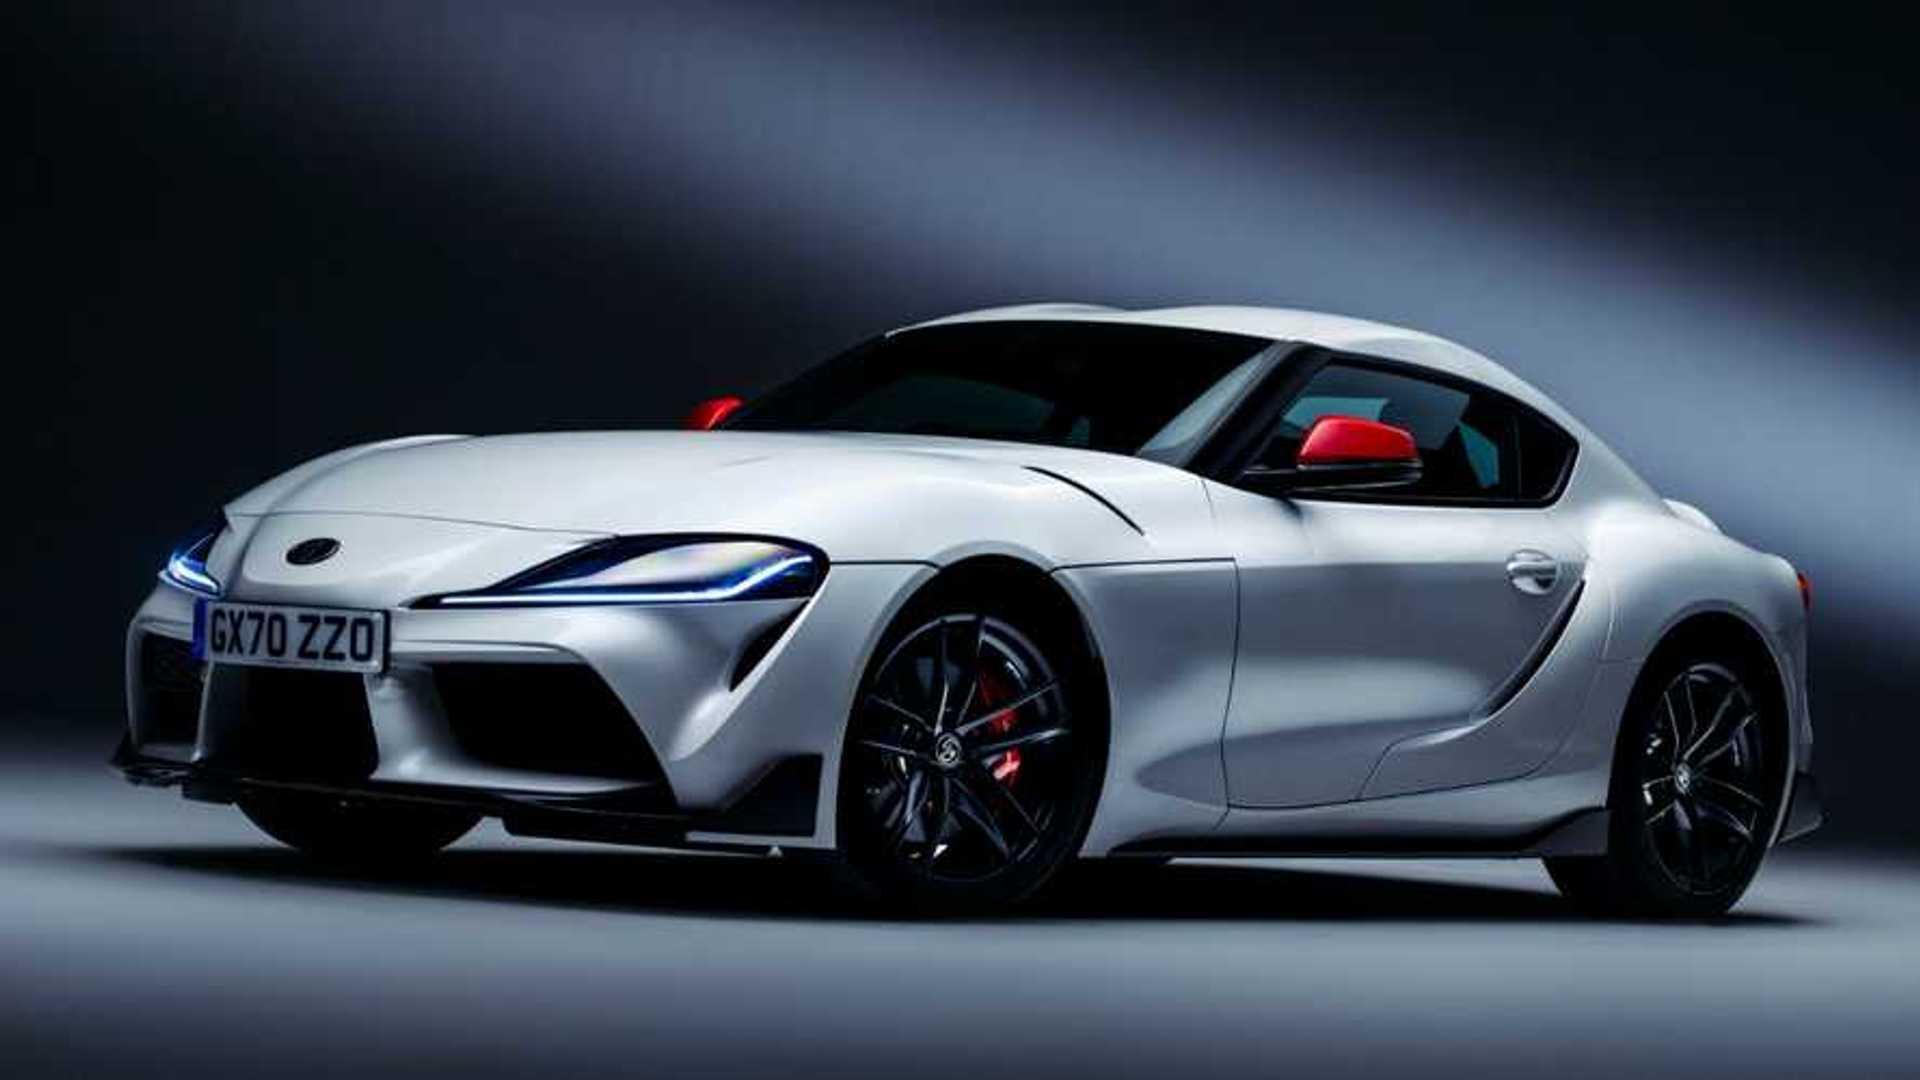 Lightweight 2 Litre Toyota Gr Supra Arrives With 46k Price Tag Toyota gr supra 2 fuji speedway